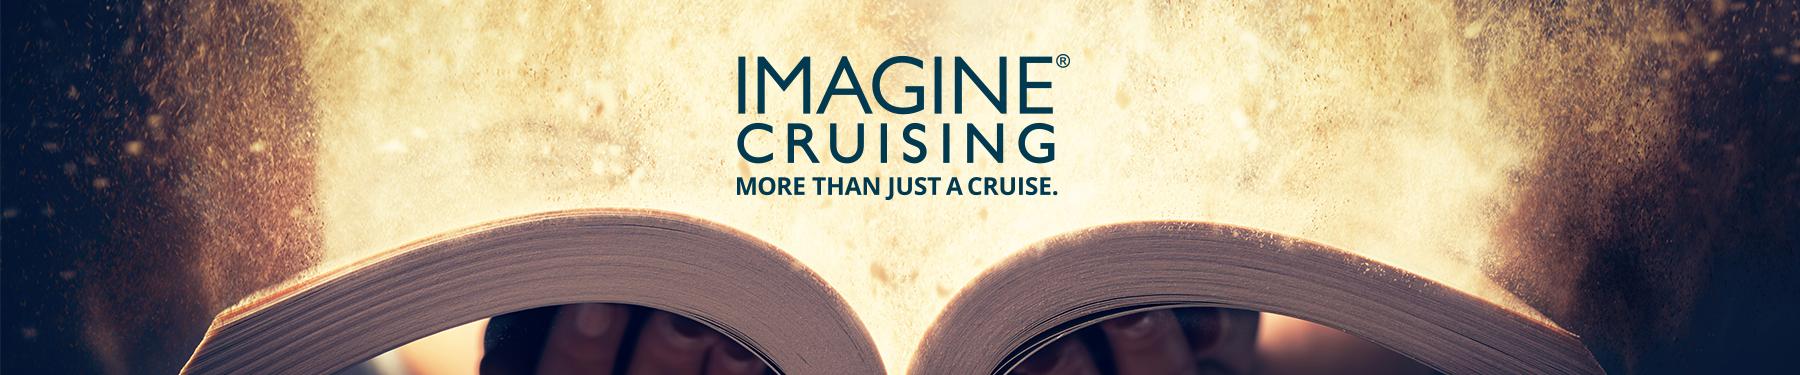 European River Cruise Hotspots  Imagine Cruising